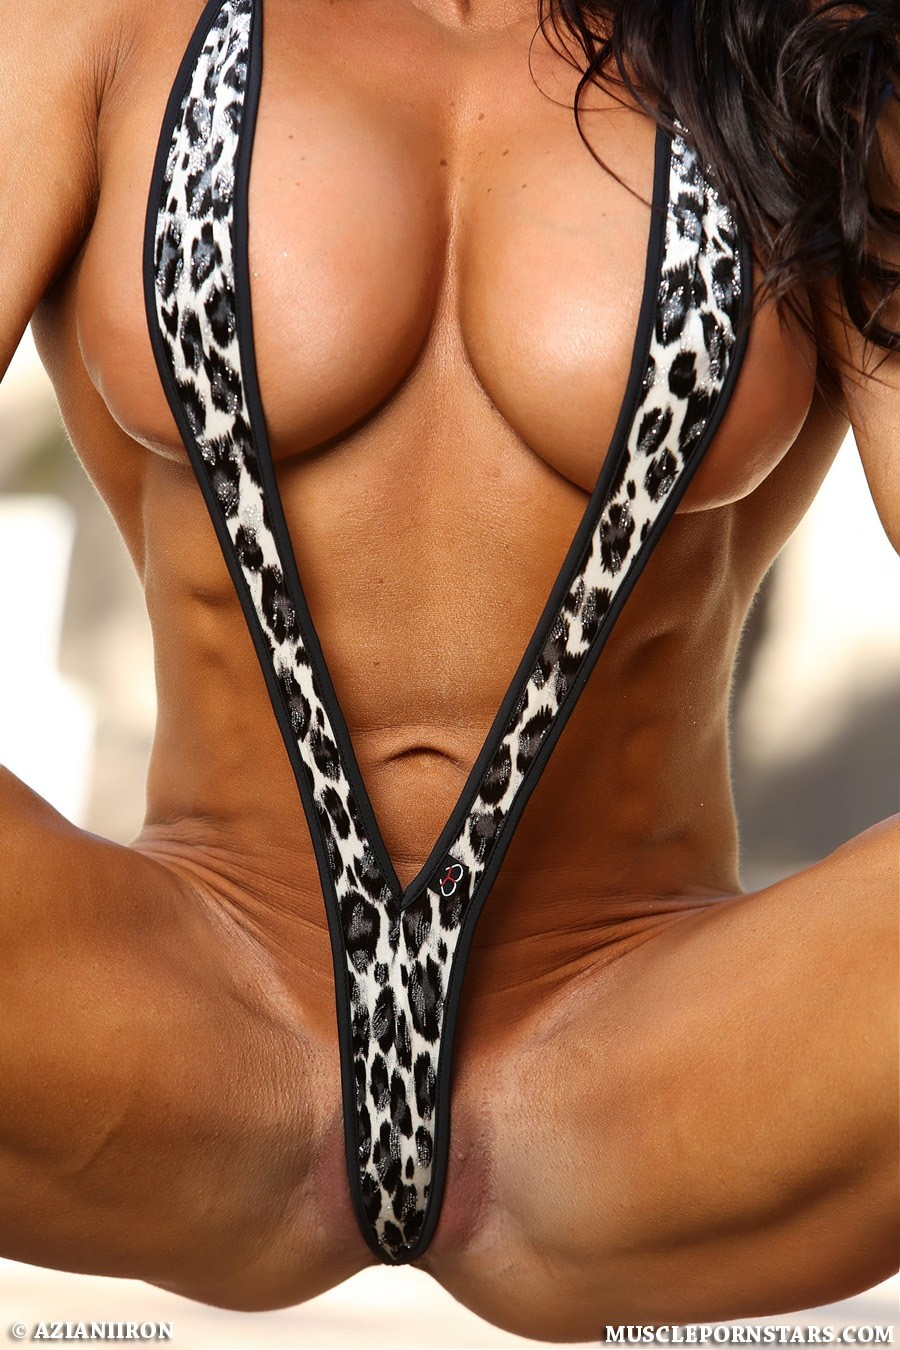 Фото культуристок в микро бикини, порно фото с участием знаменитостей